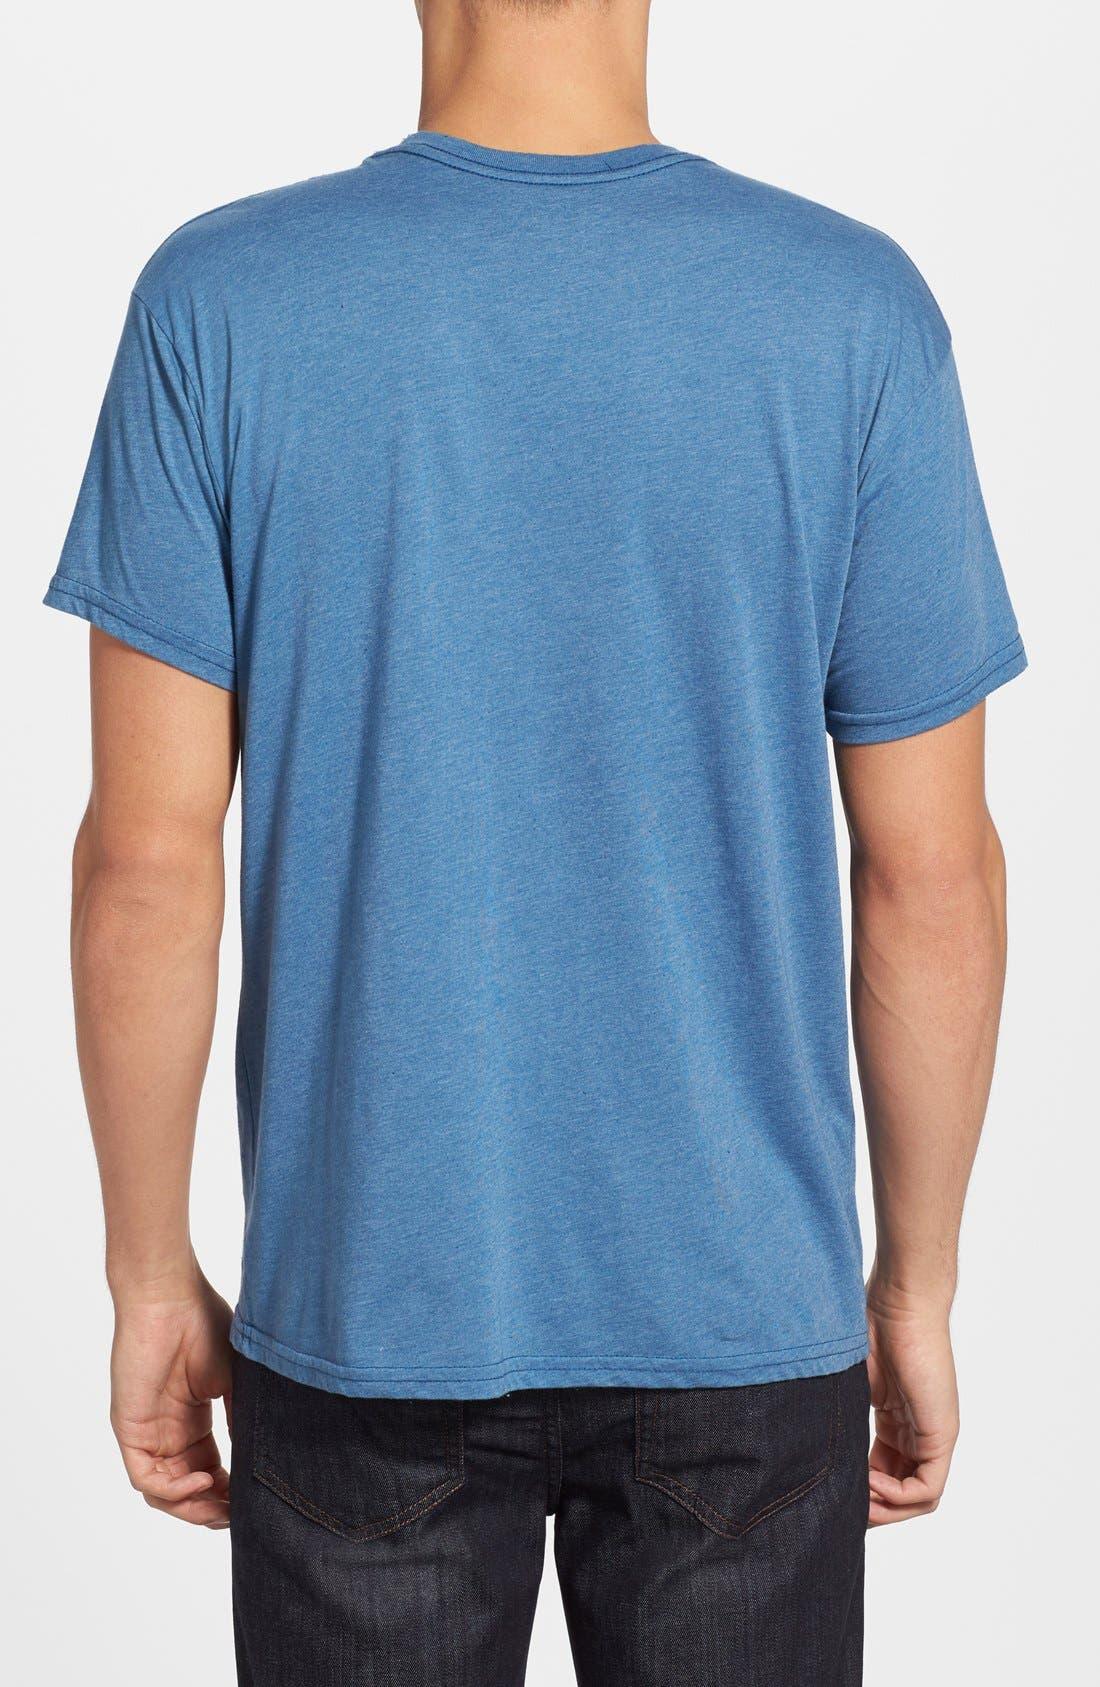 Alternate Image 2  - Retro Brand 'Steiner's Bar Room' Slim Fit Graphic T-Shirt